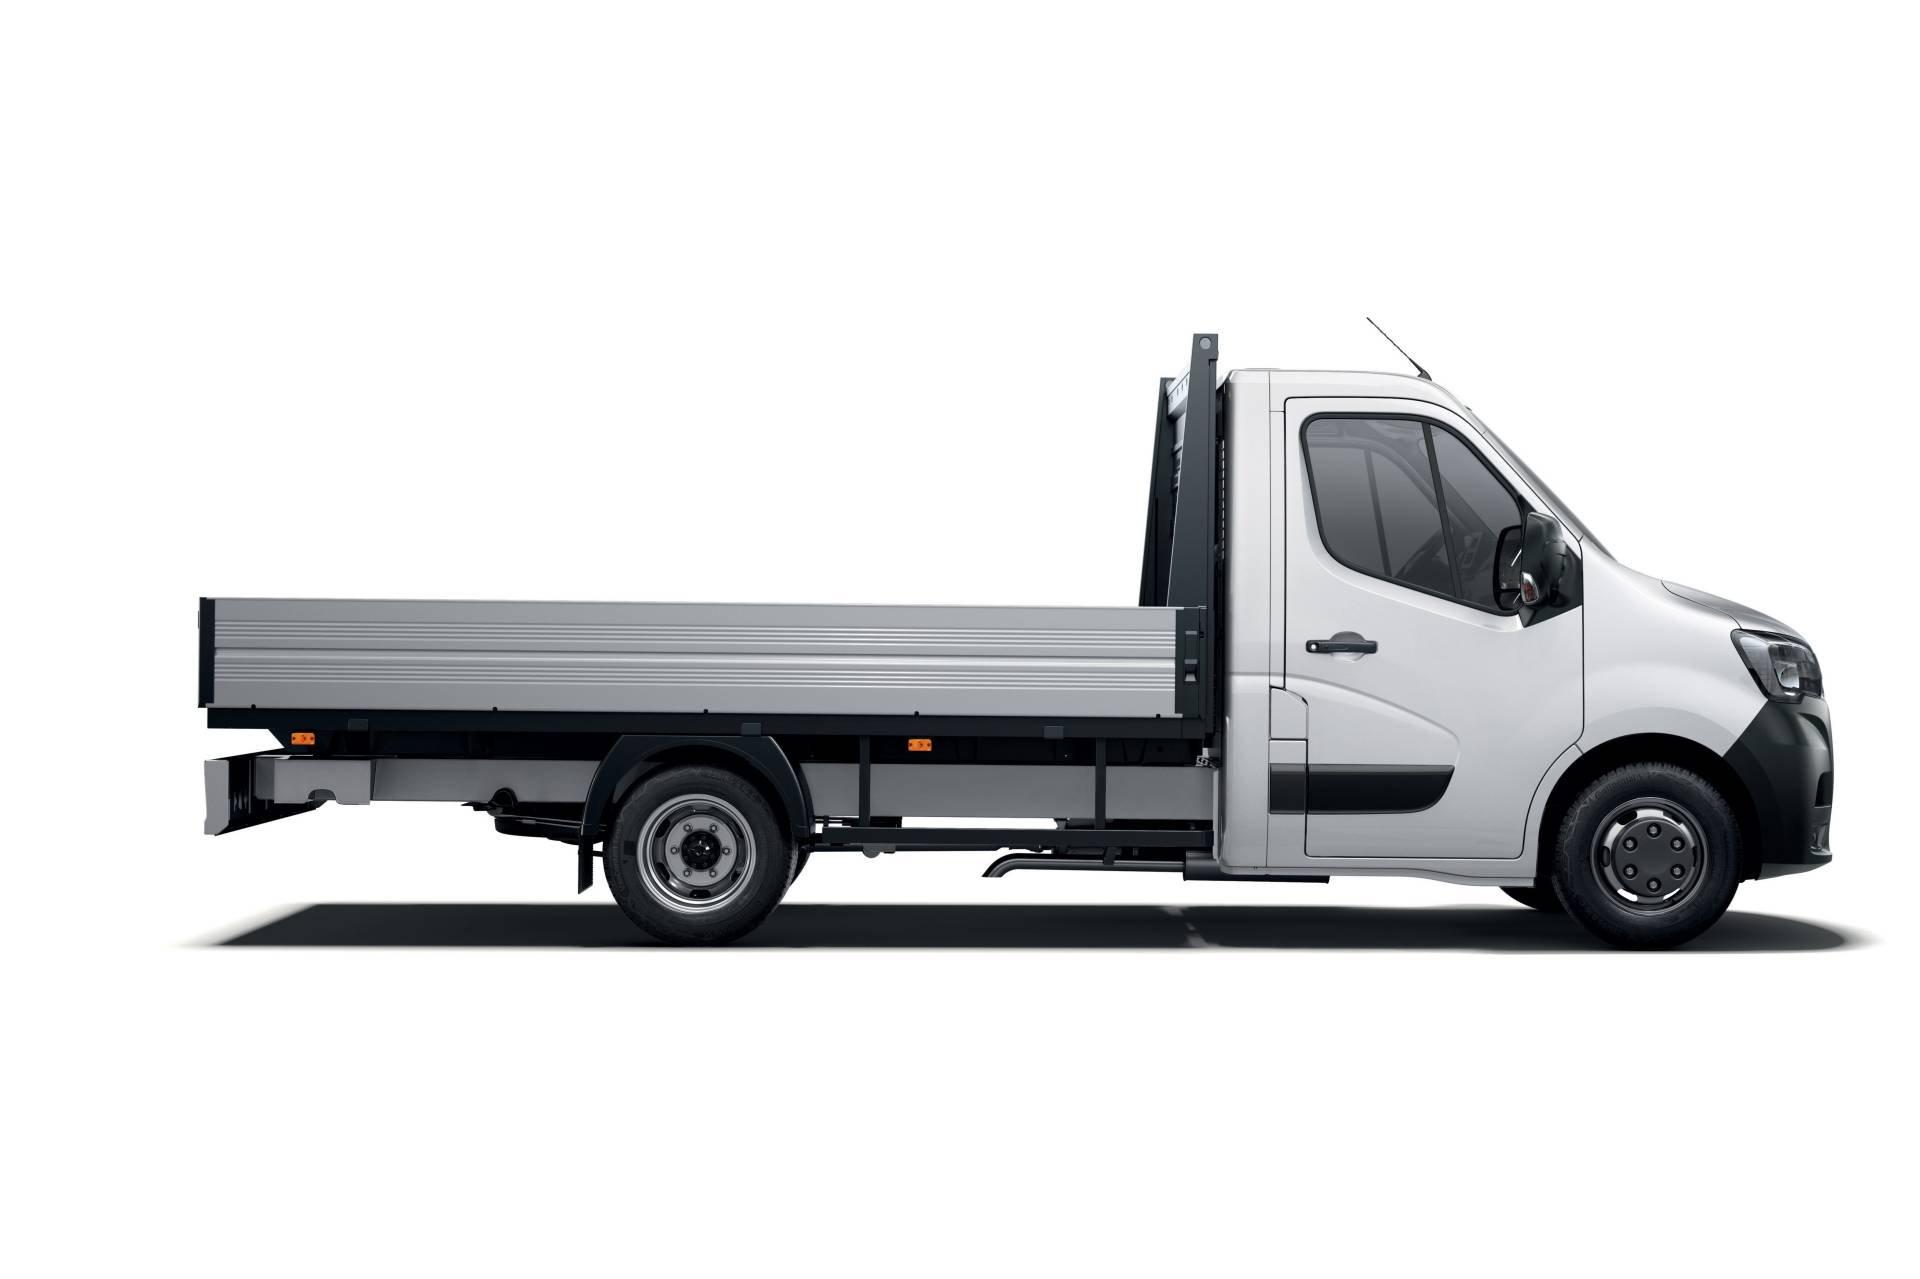 792eb34a-2019my-renault-master-van-facelift-14